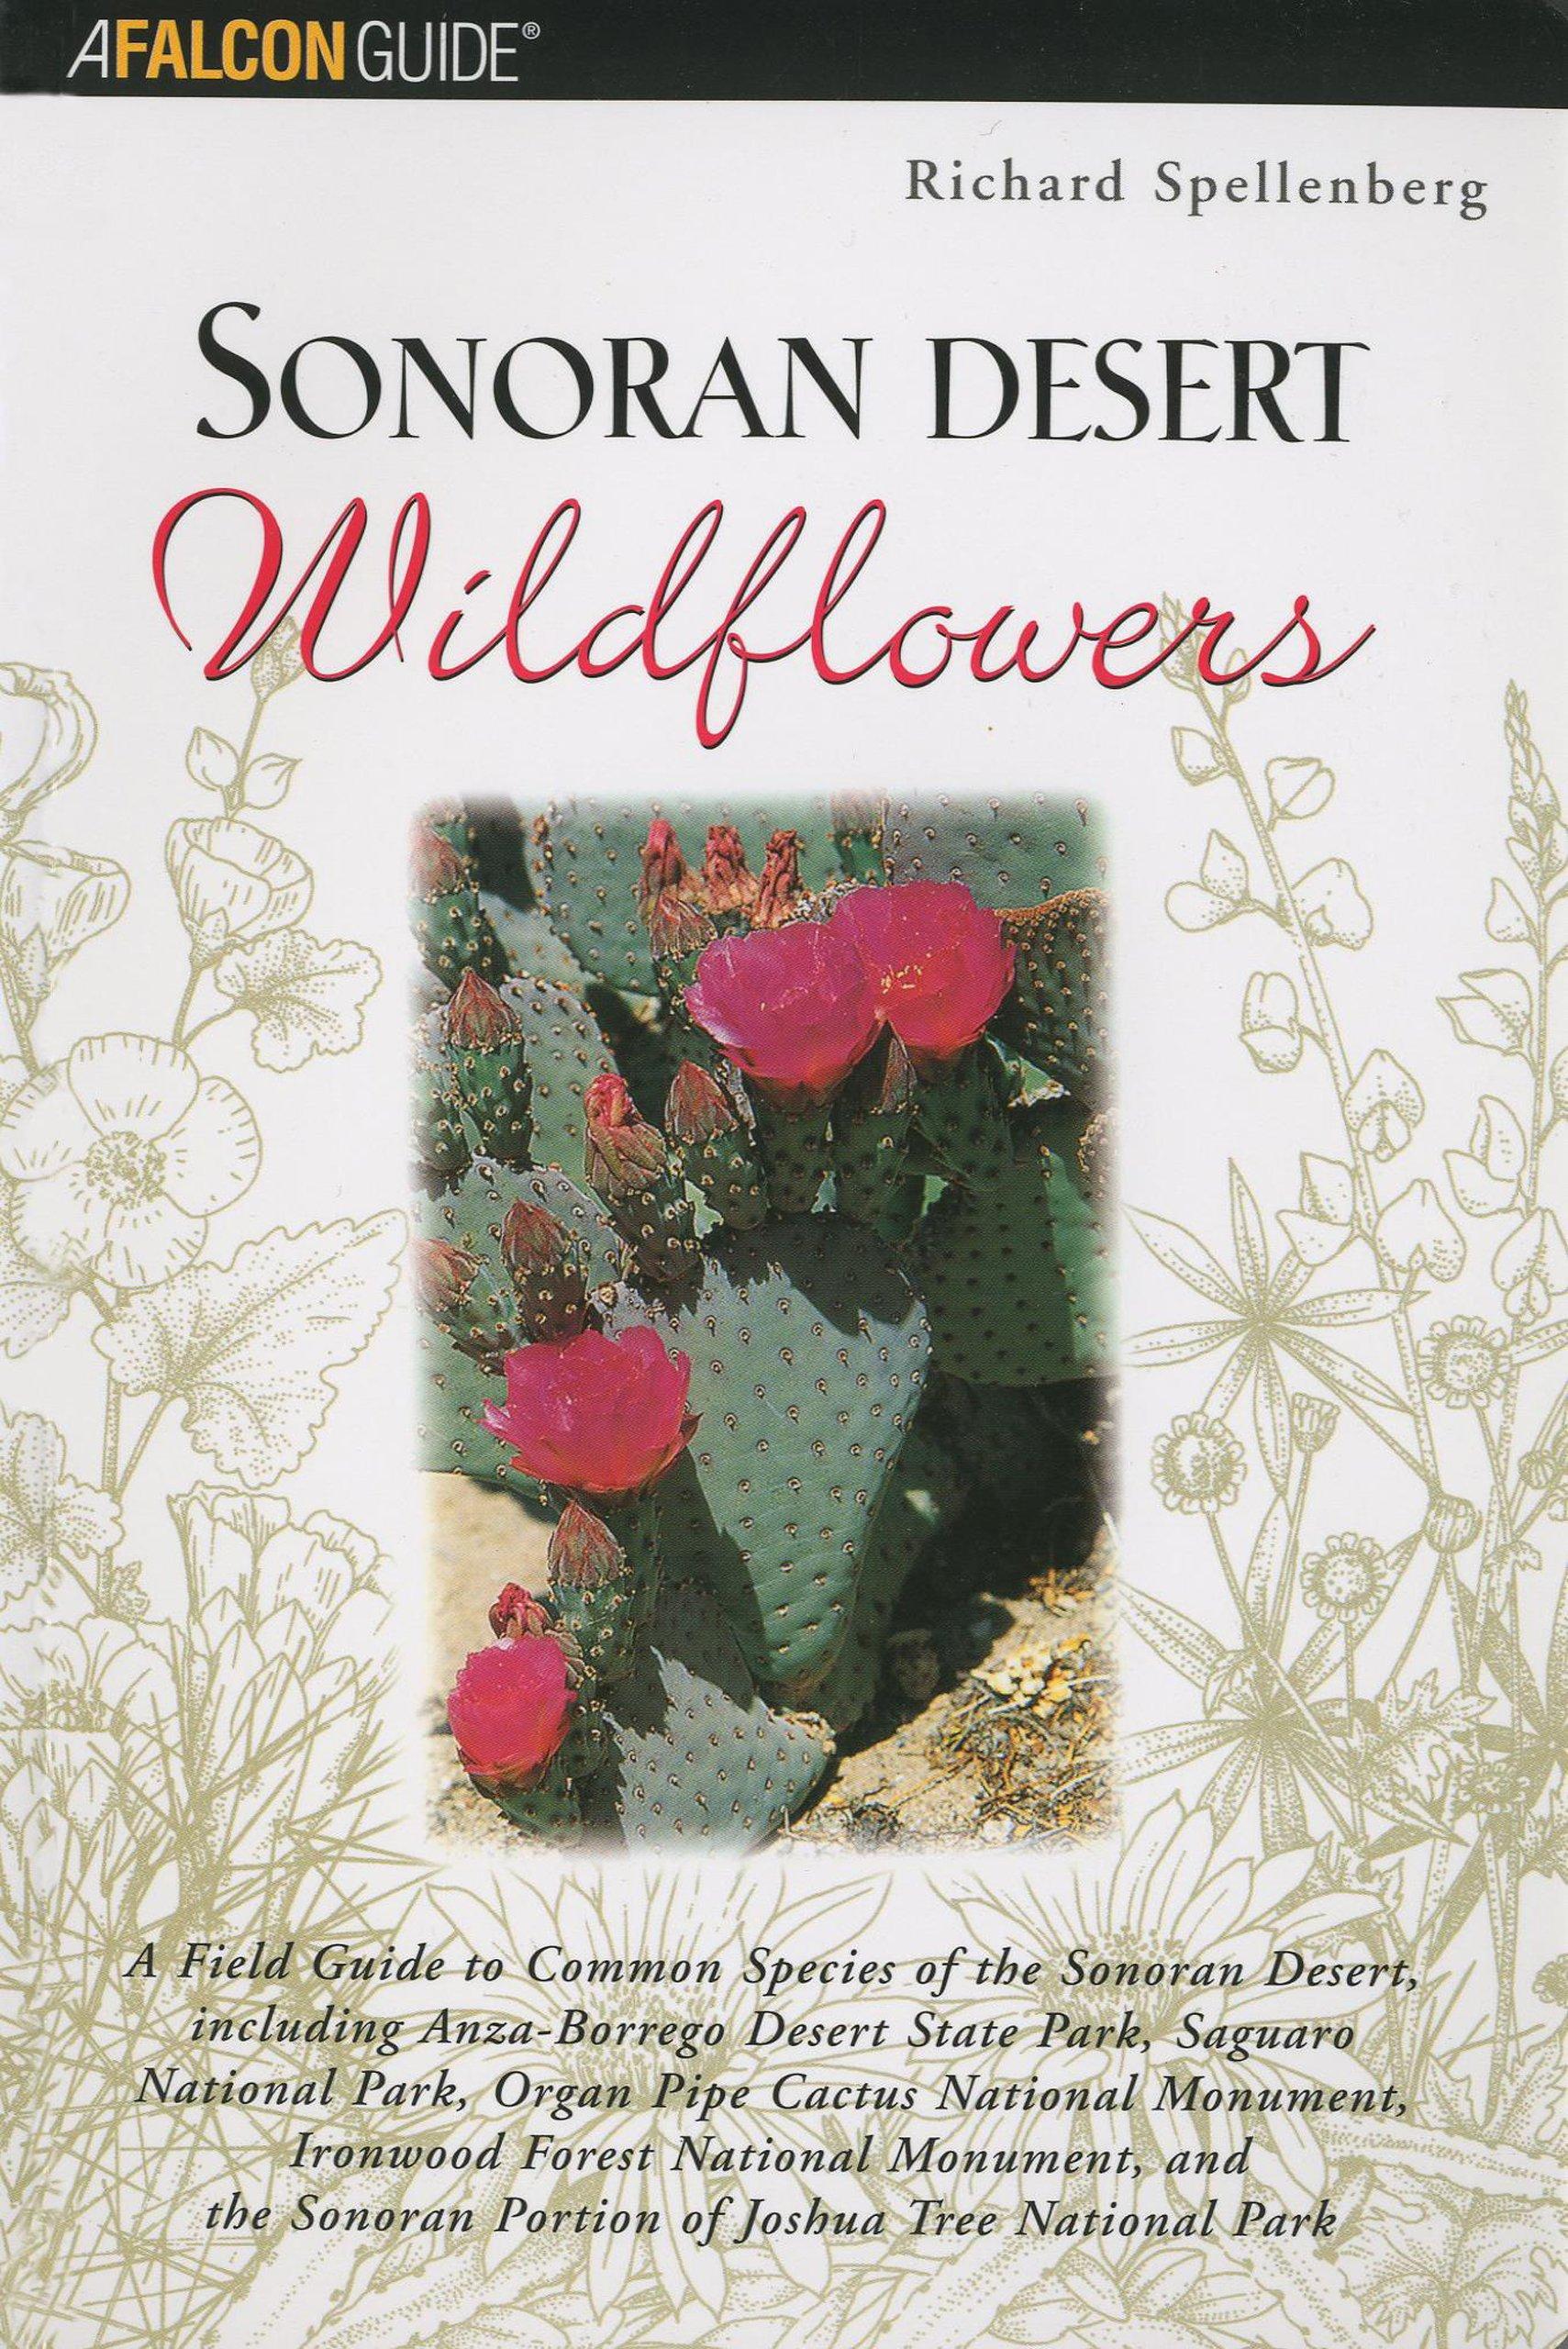 Sonoran Desert Wildflowers: A Field Guide to the Common Wildflowers of the Sonoran Desert, Including Anza-Borrego Desert State Park, Saguaro National ... Joshua Tree National Park (Wildflower Series) ebook